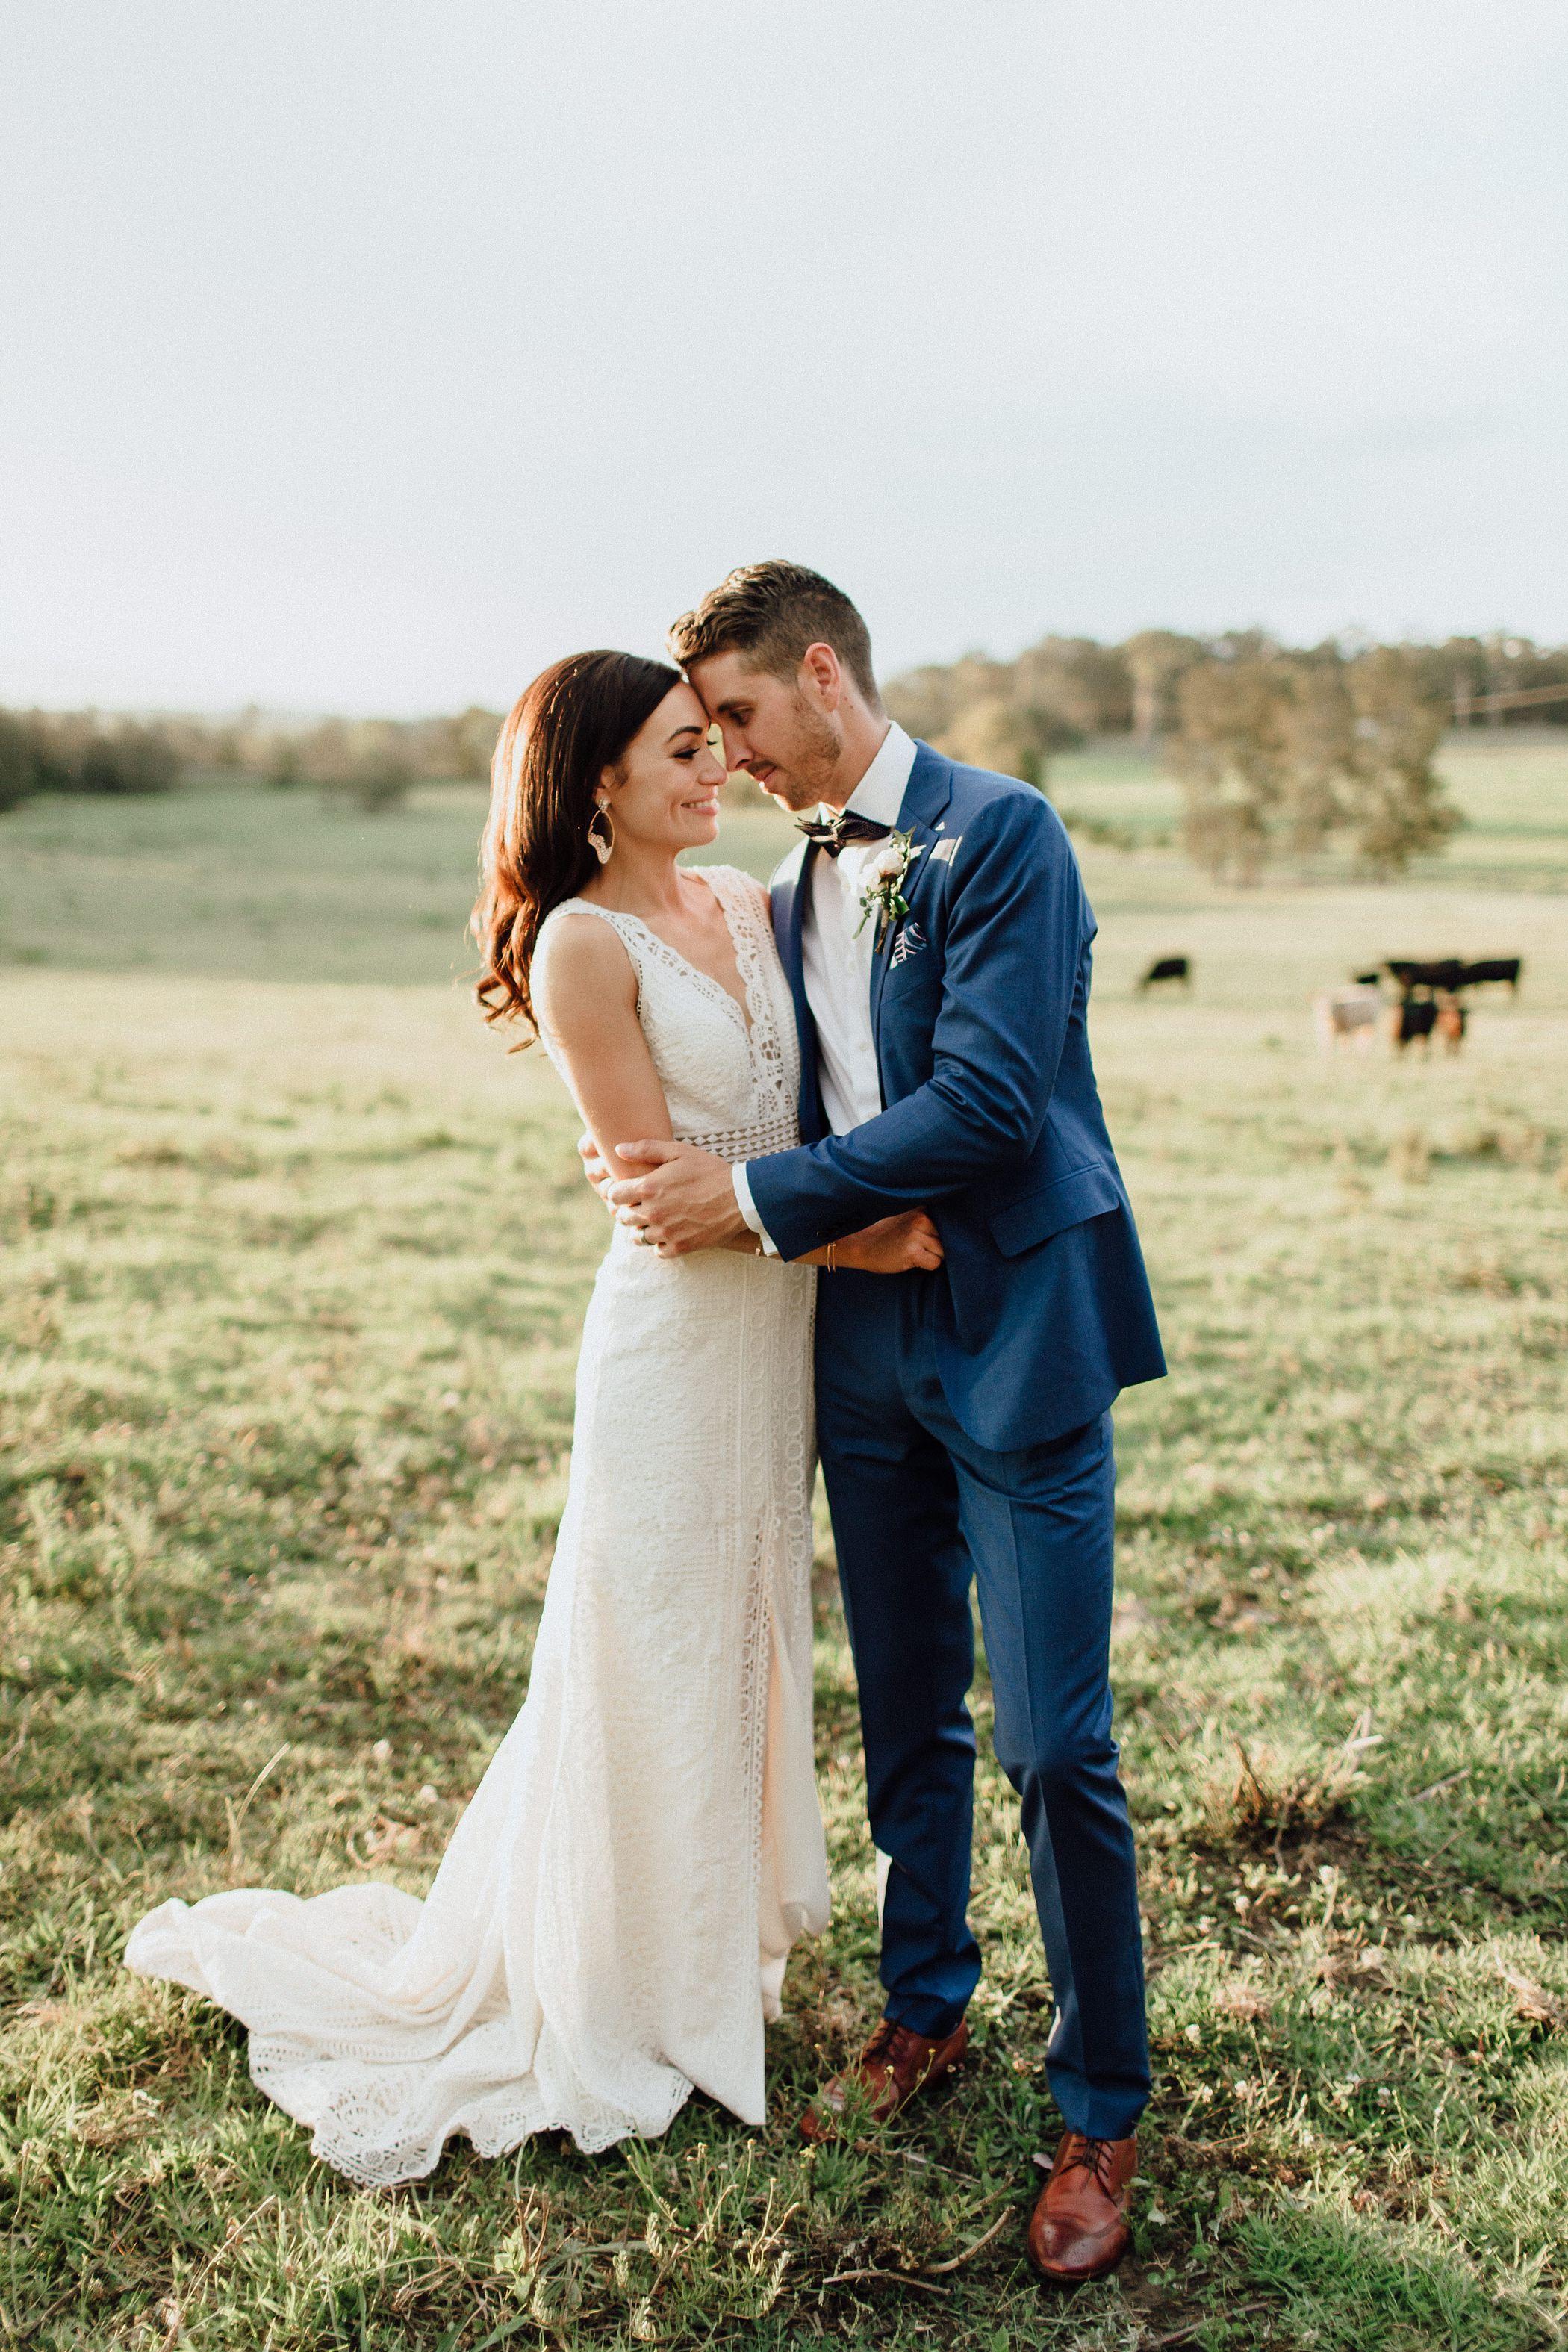 lauren-anne-photography-newcastle-wedding-photographer-mindaribba-house_0116.jpg